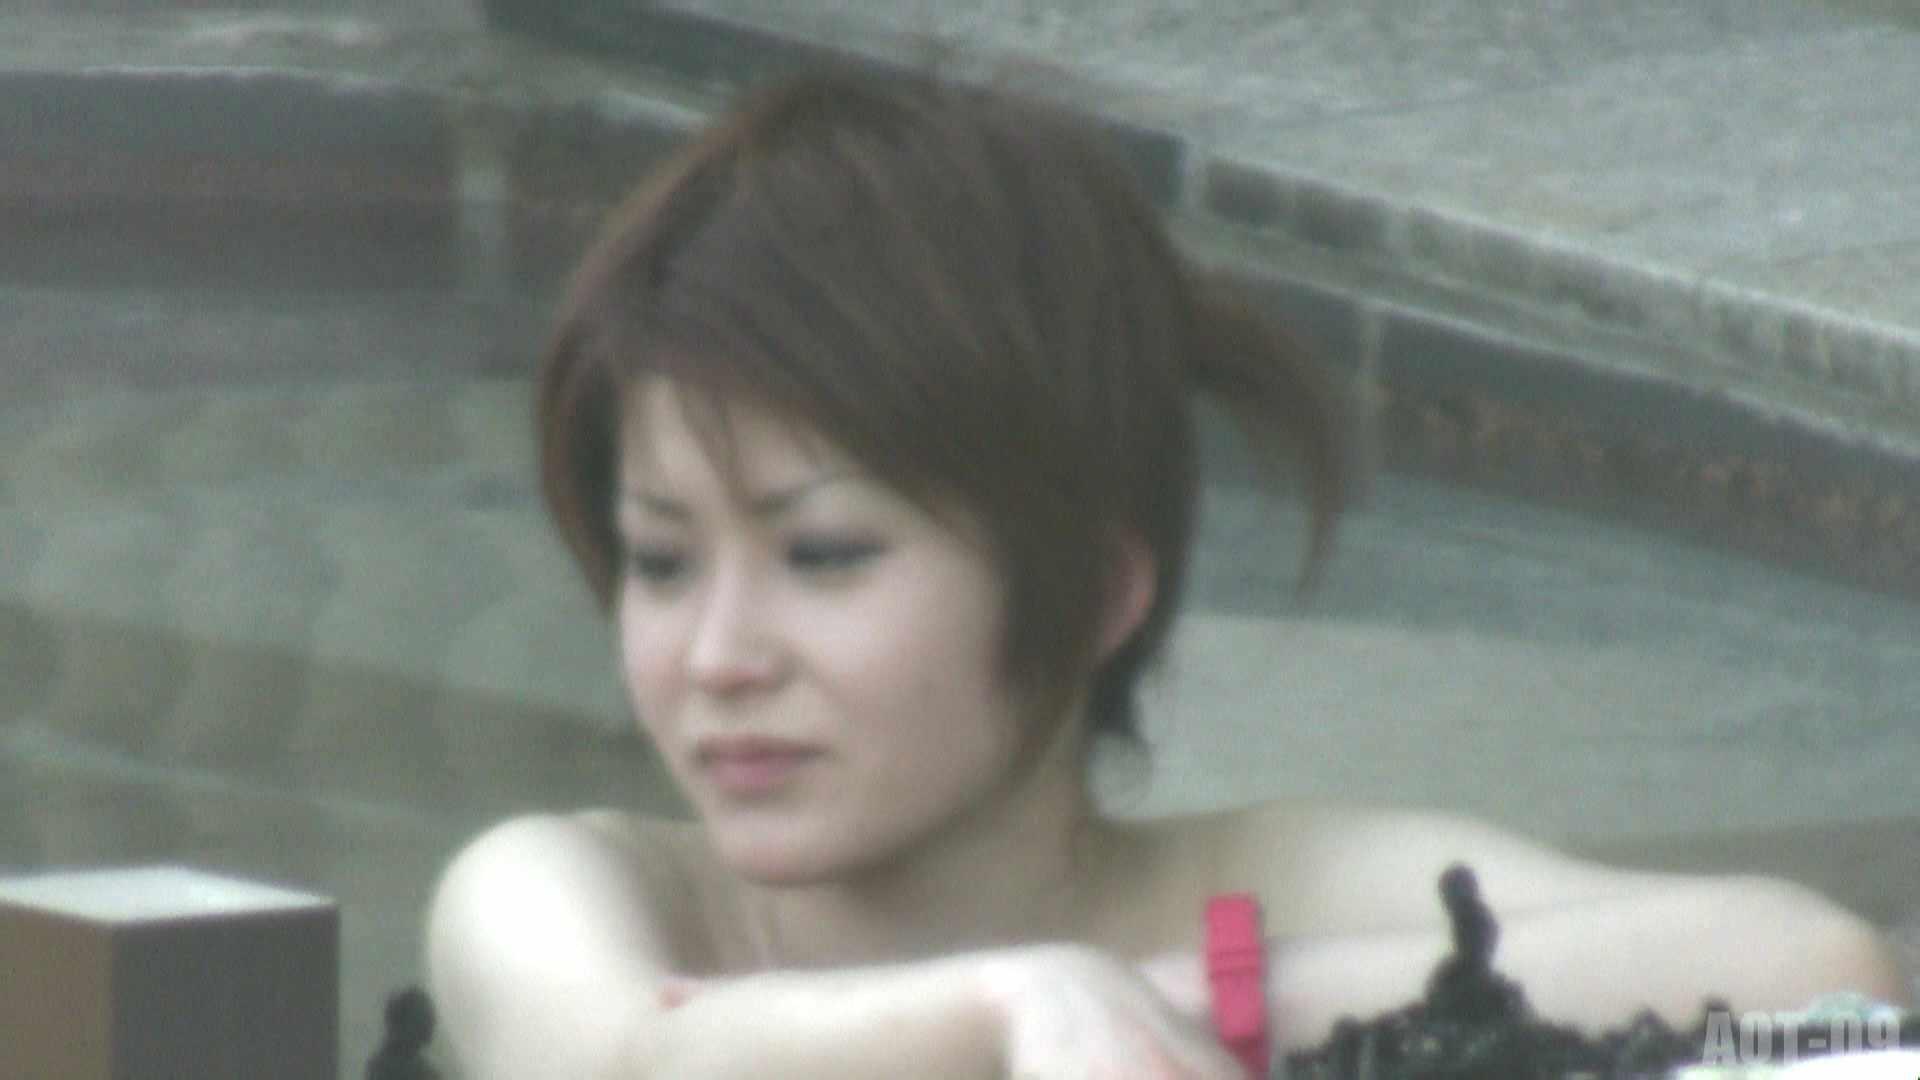 Aquaな露天風呂Vol.779 盗撮 SEX無修正画像 81連発 80